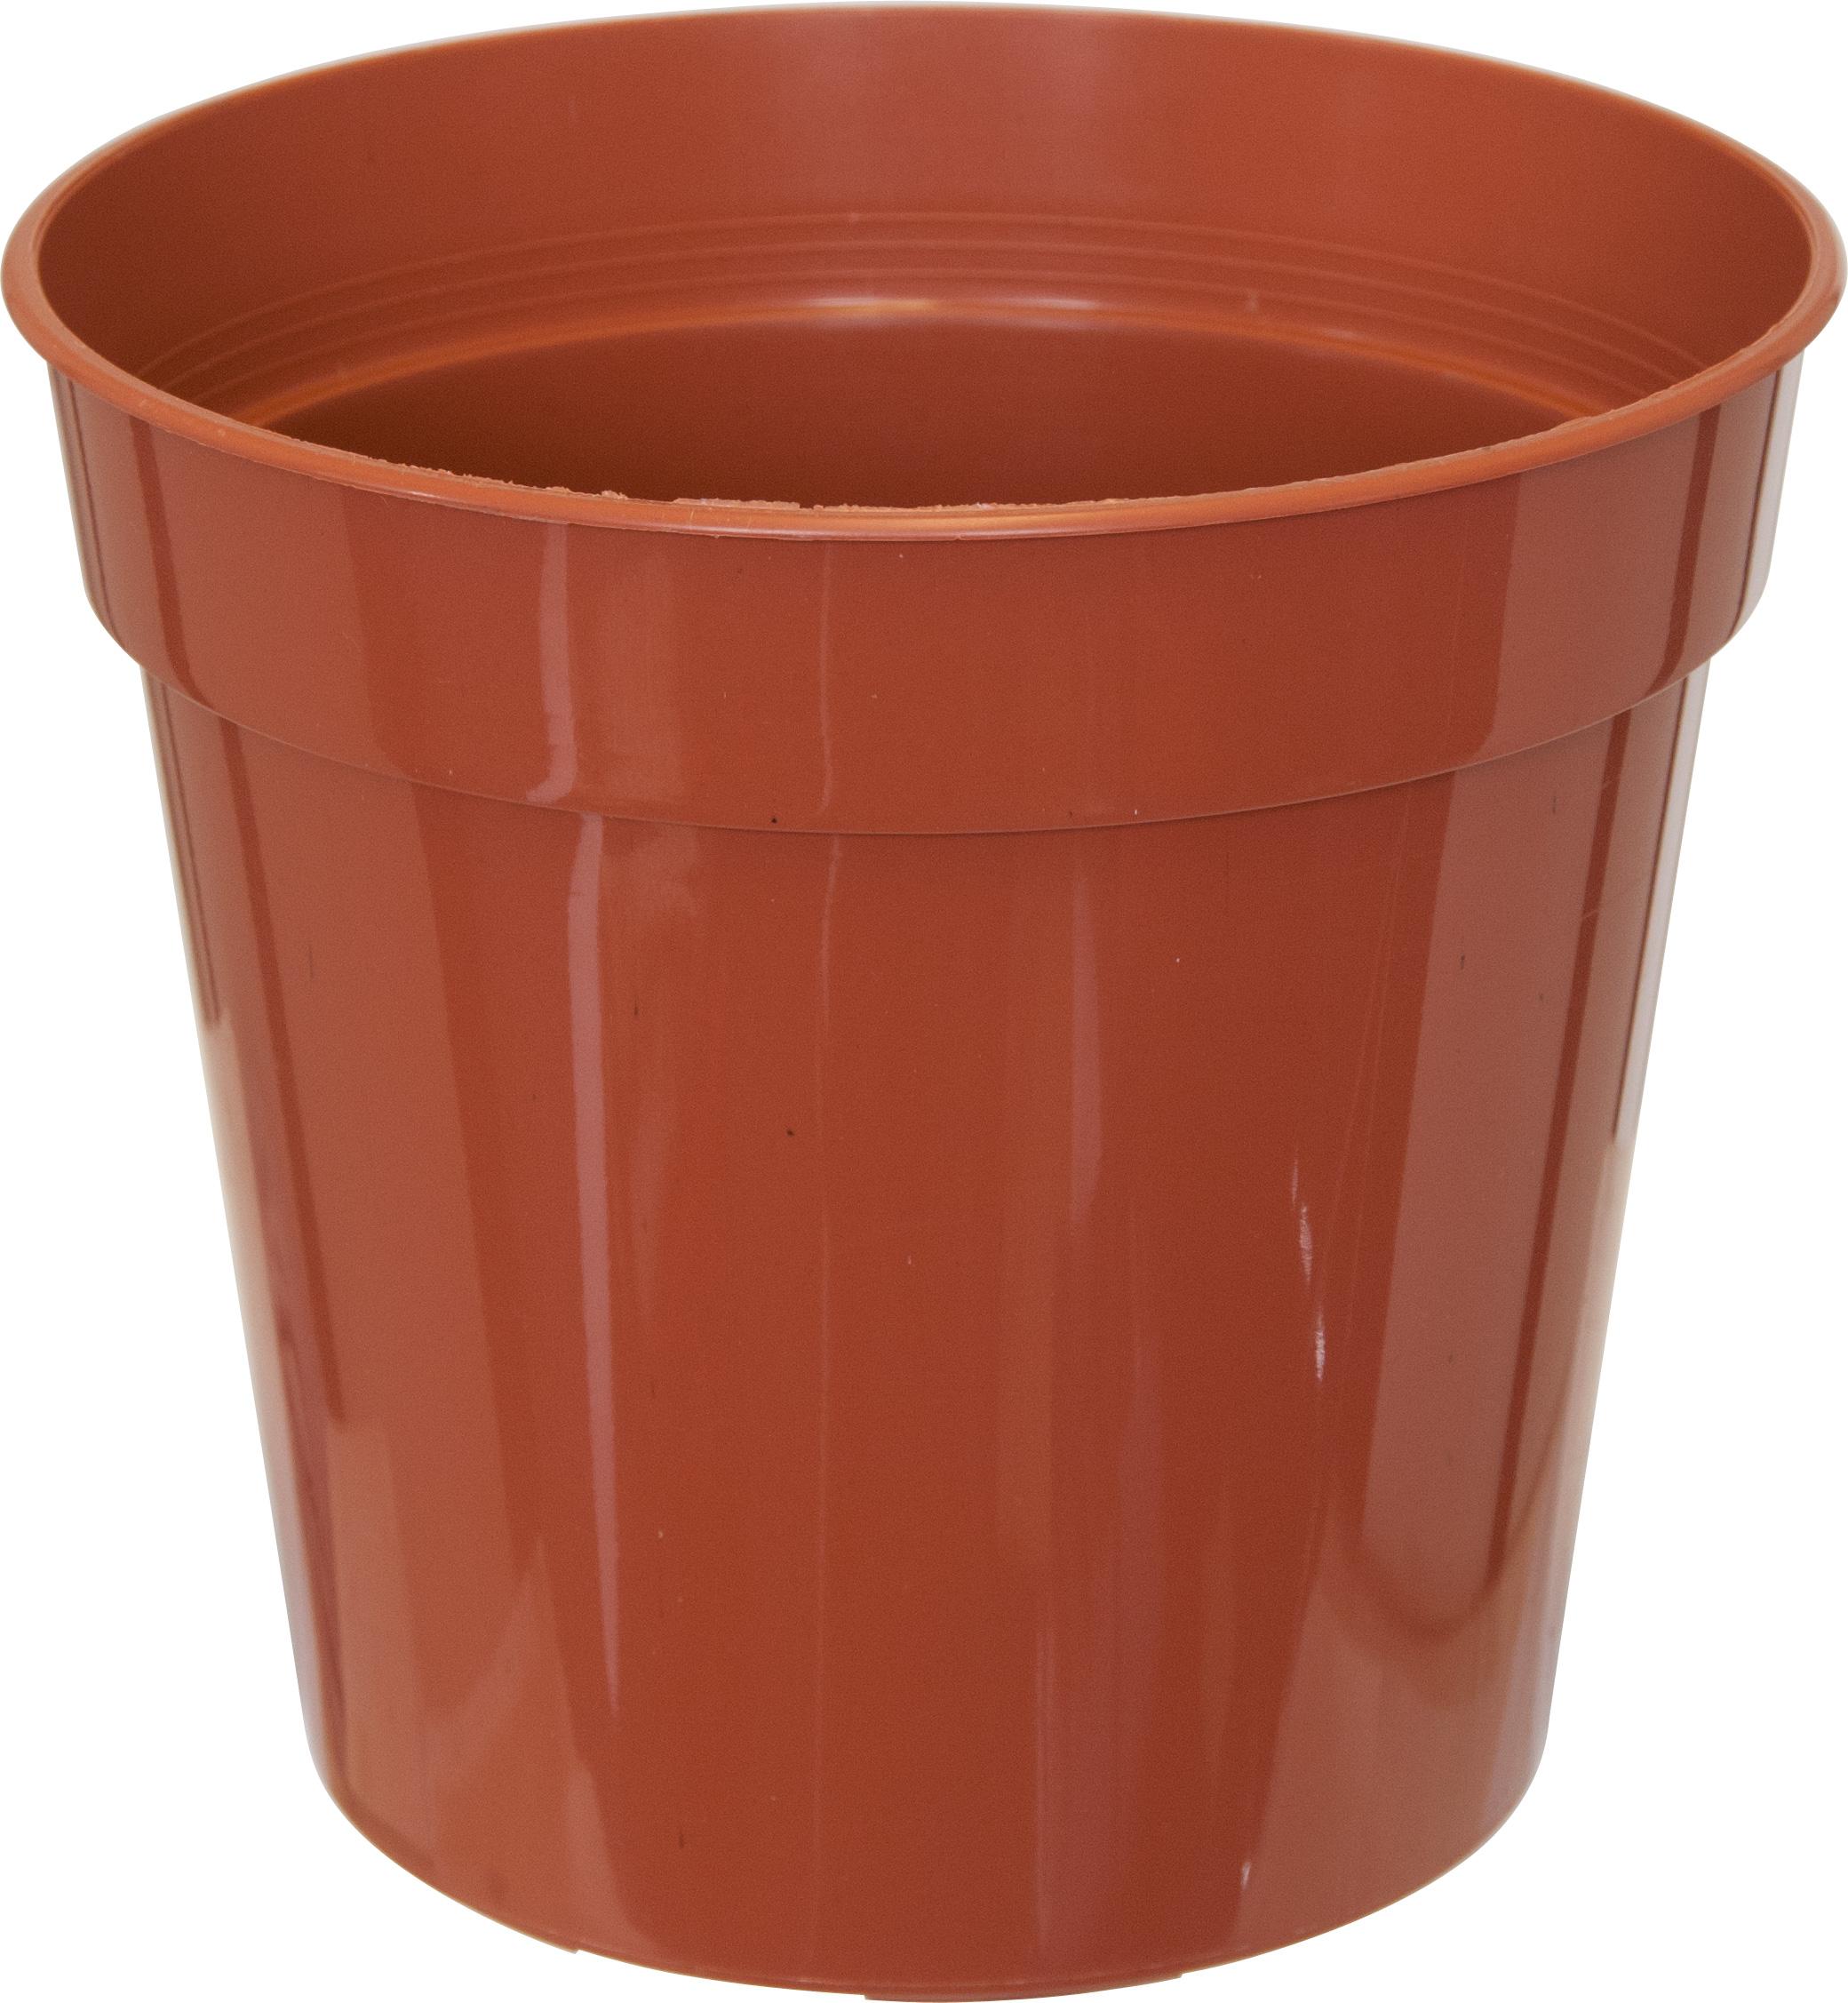 Sankey 8 in/20 cm Plastic Flower Pot   M W Partridge & Co Ltd ...